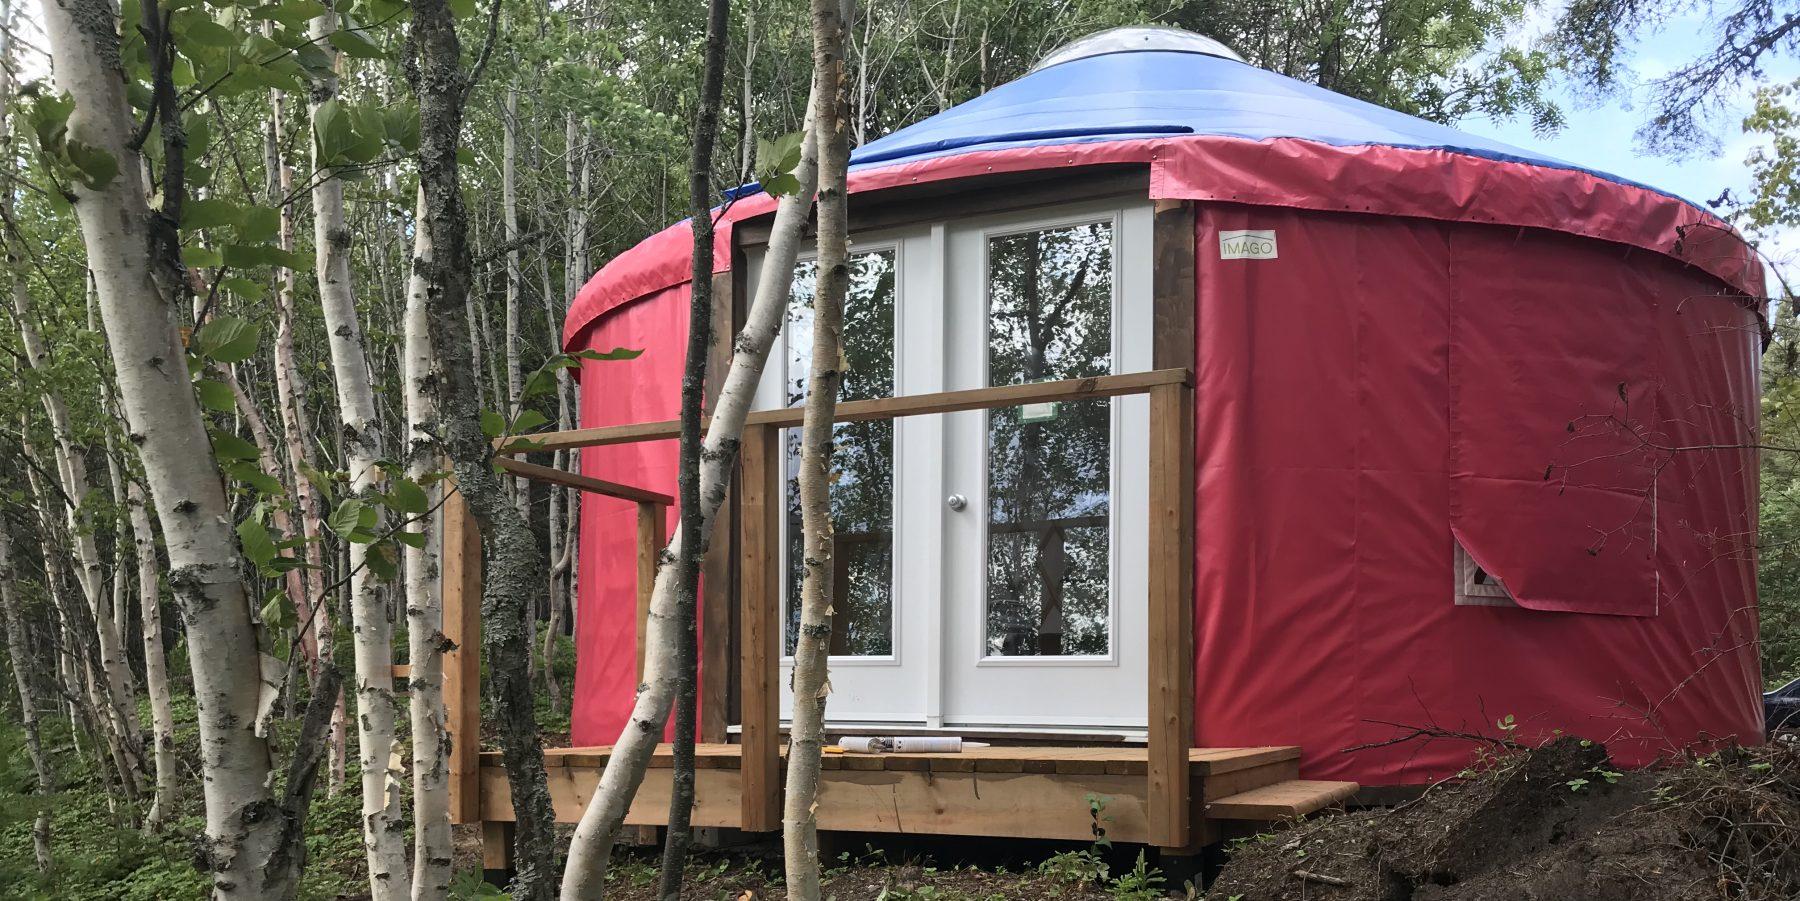 Camping Portneuf-sur-Mer